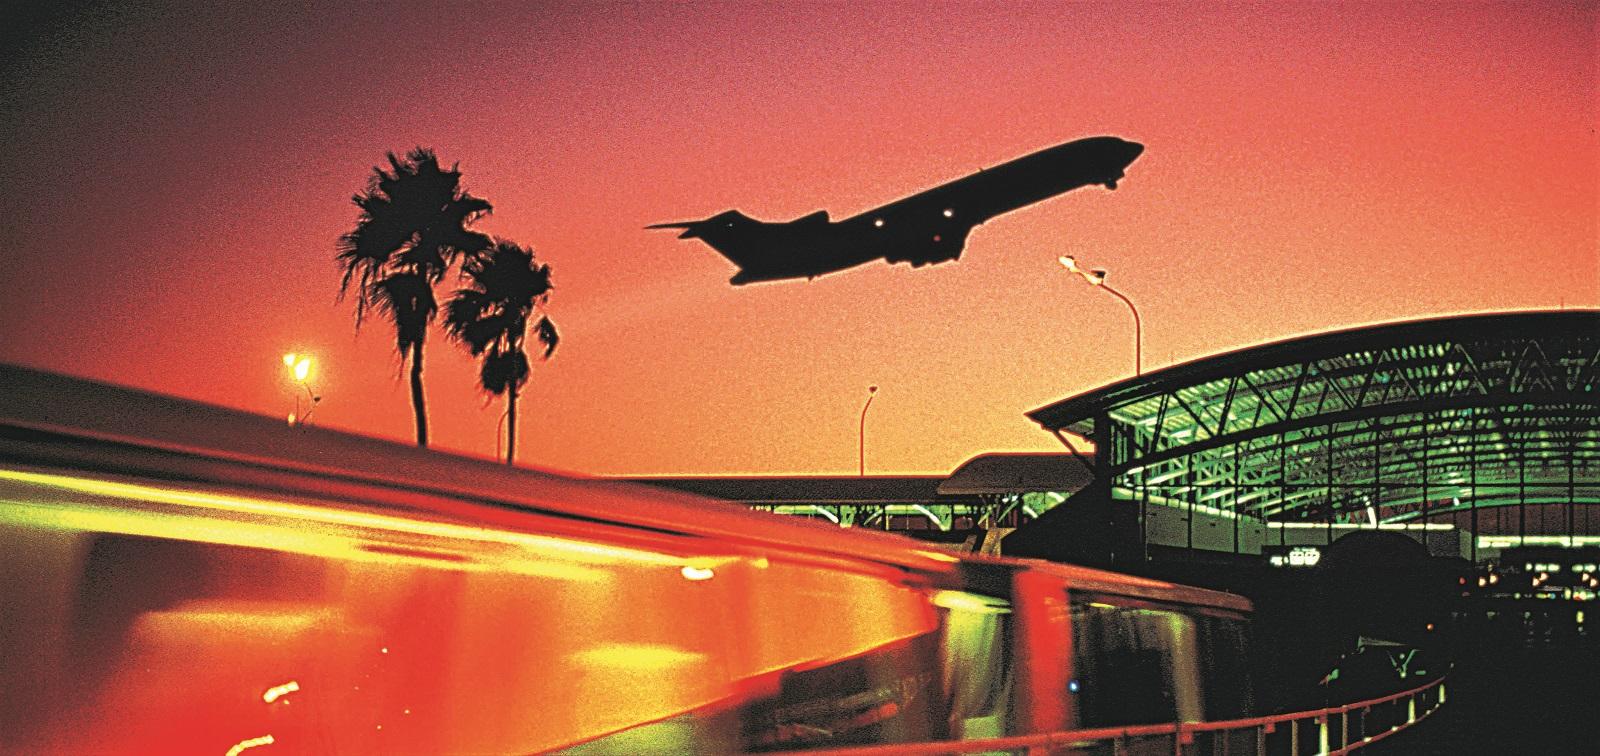 K-Tampa International Airport